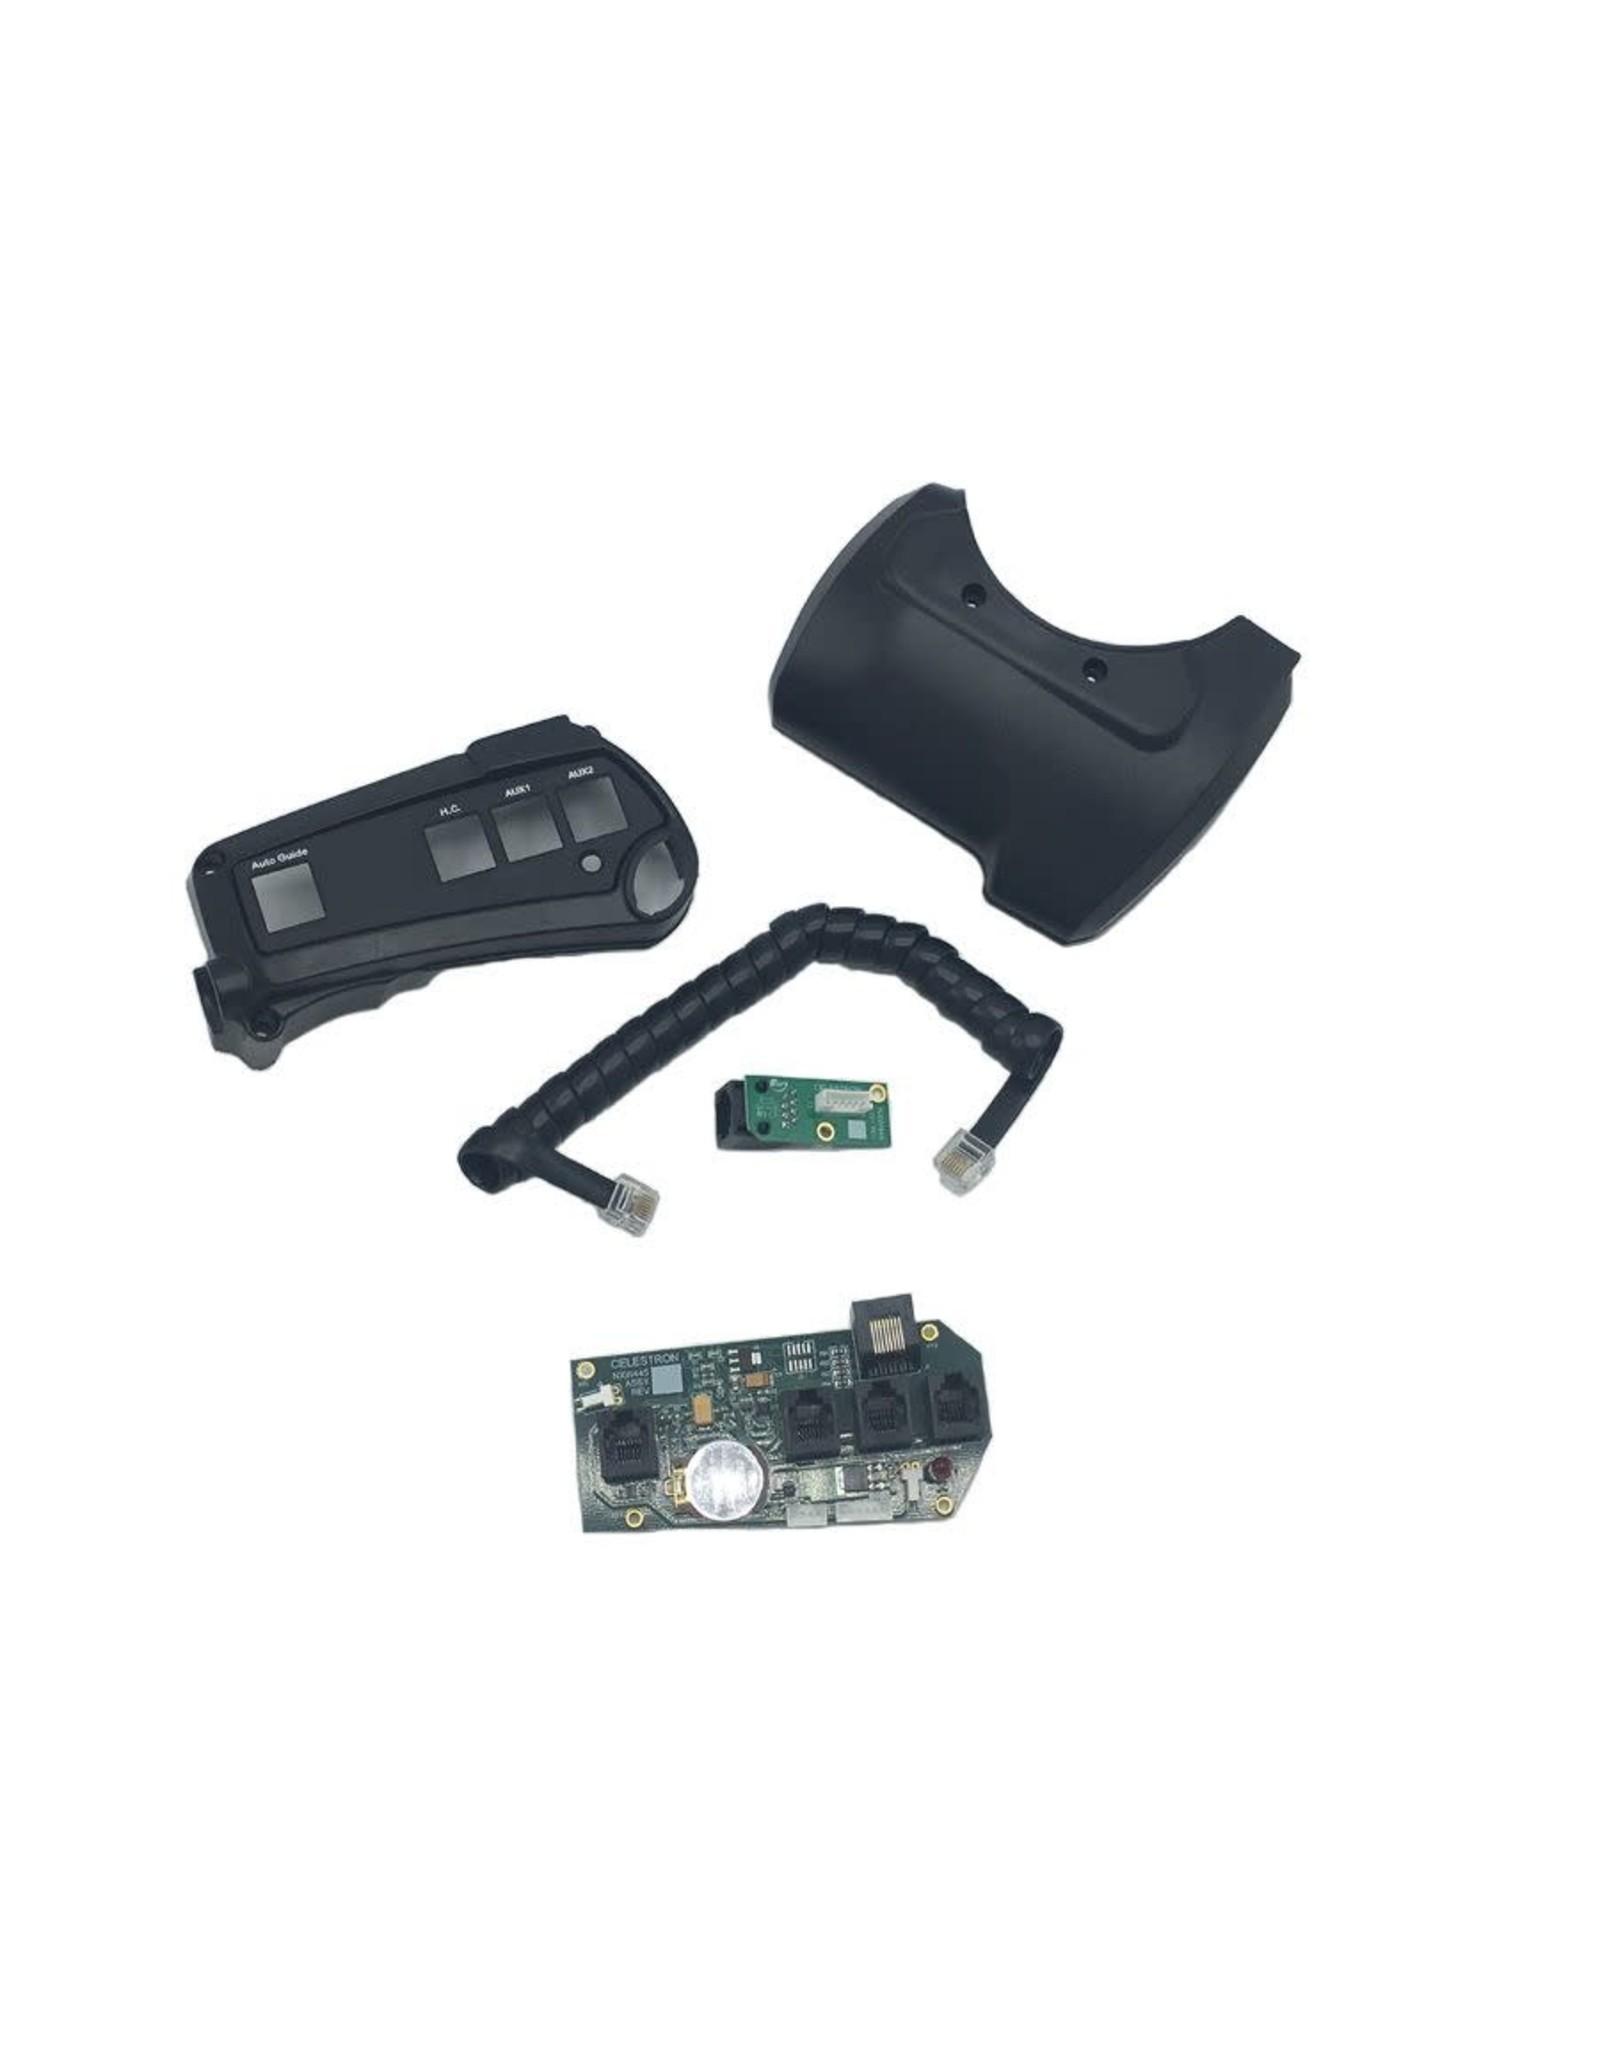 Celestron Celestron Electronics Retrofit Kit for the Celestron Advanced VX mount